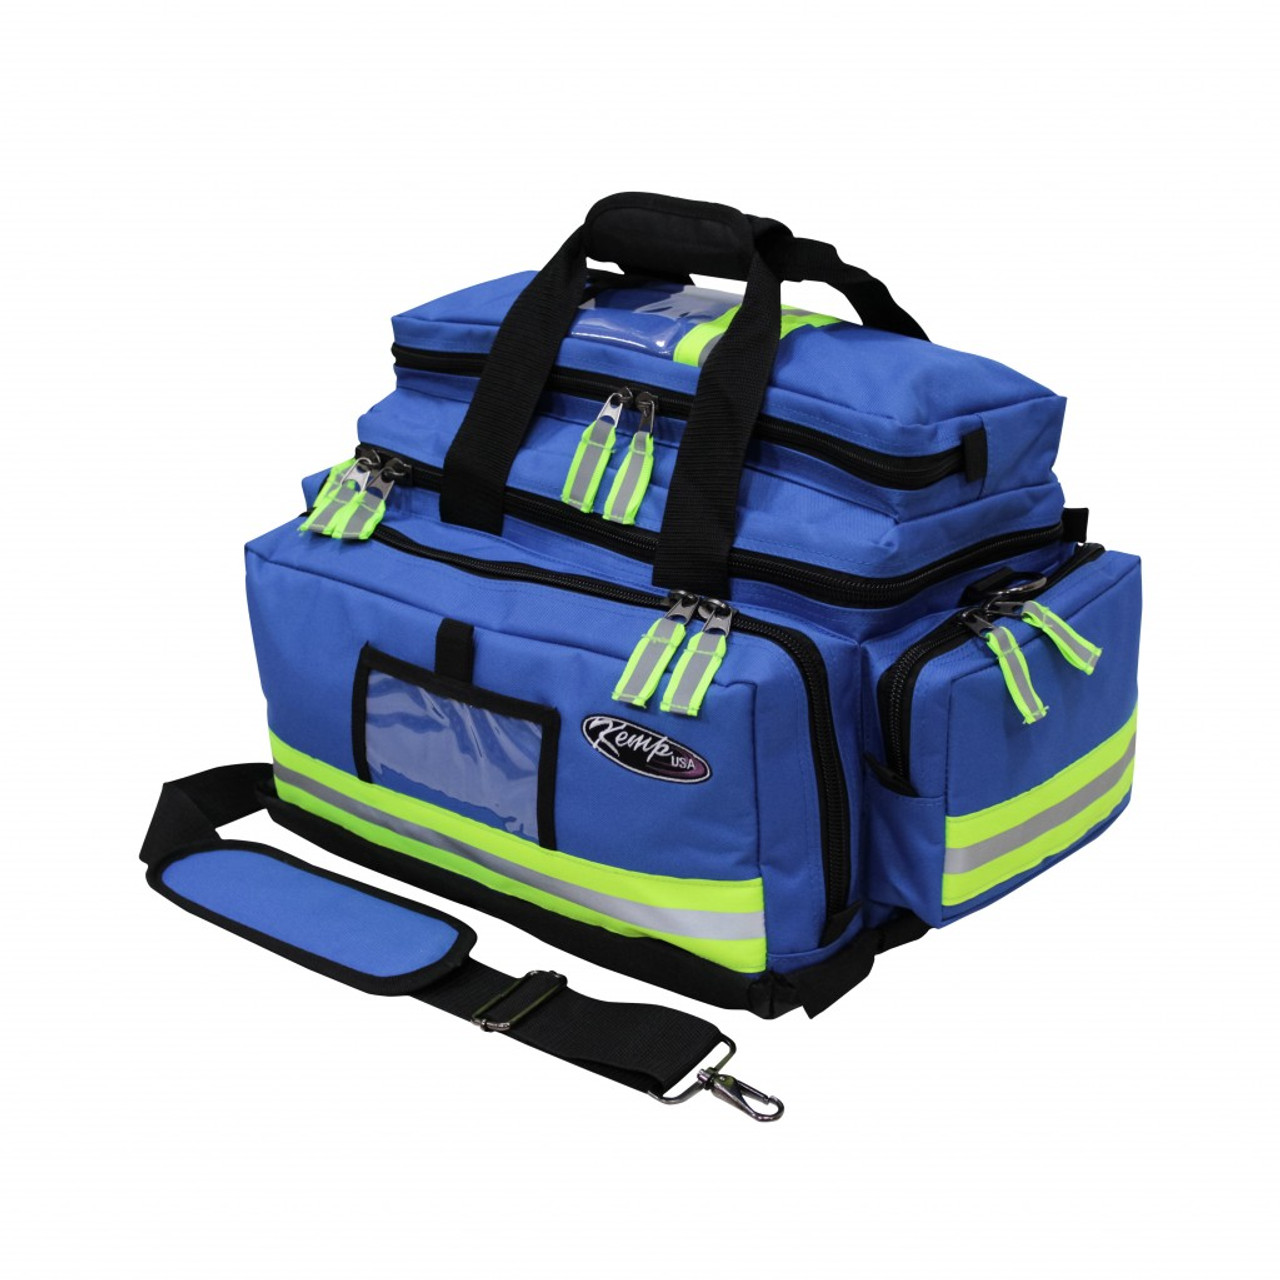 Large Professional Trauma Bag - Royal Blue